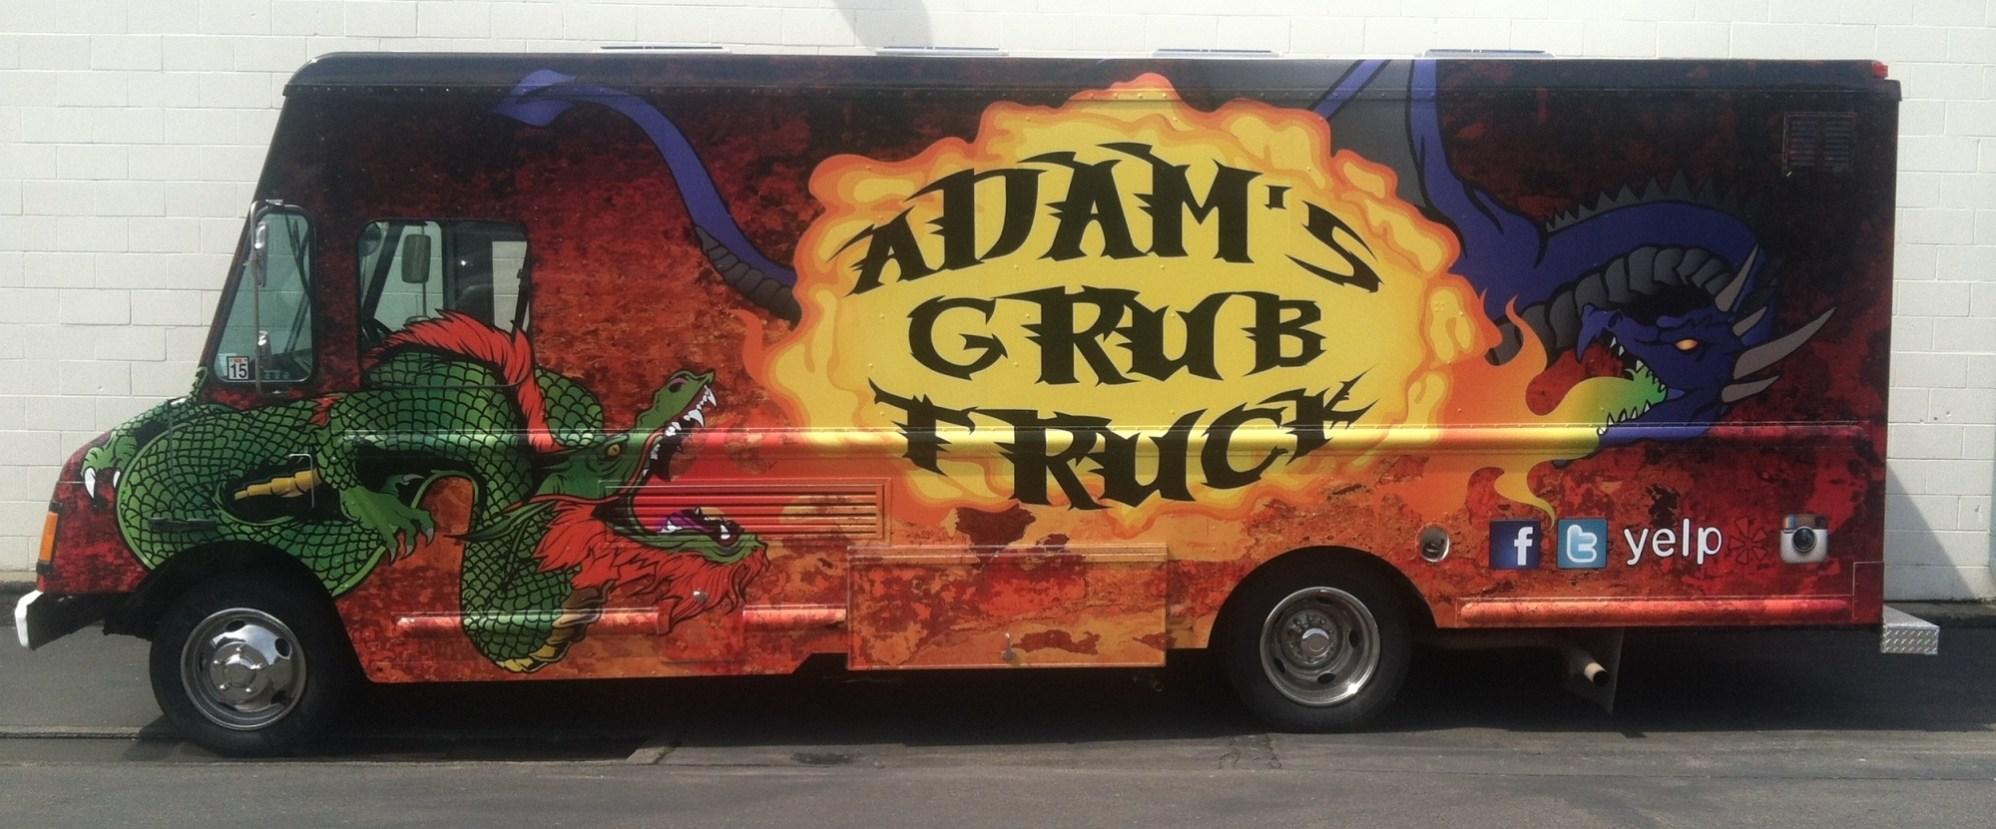 adam's grub truck food truck wrap-03